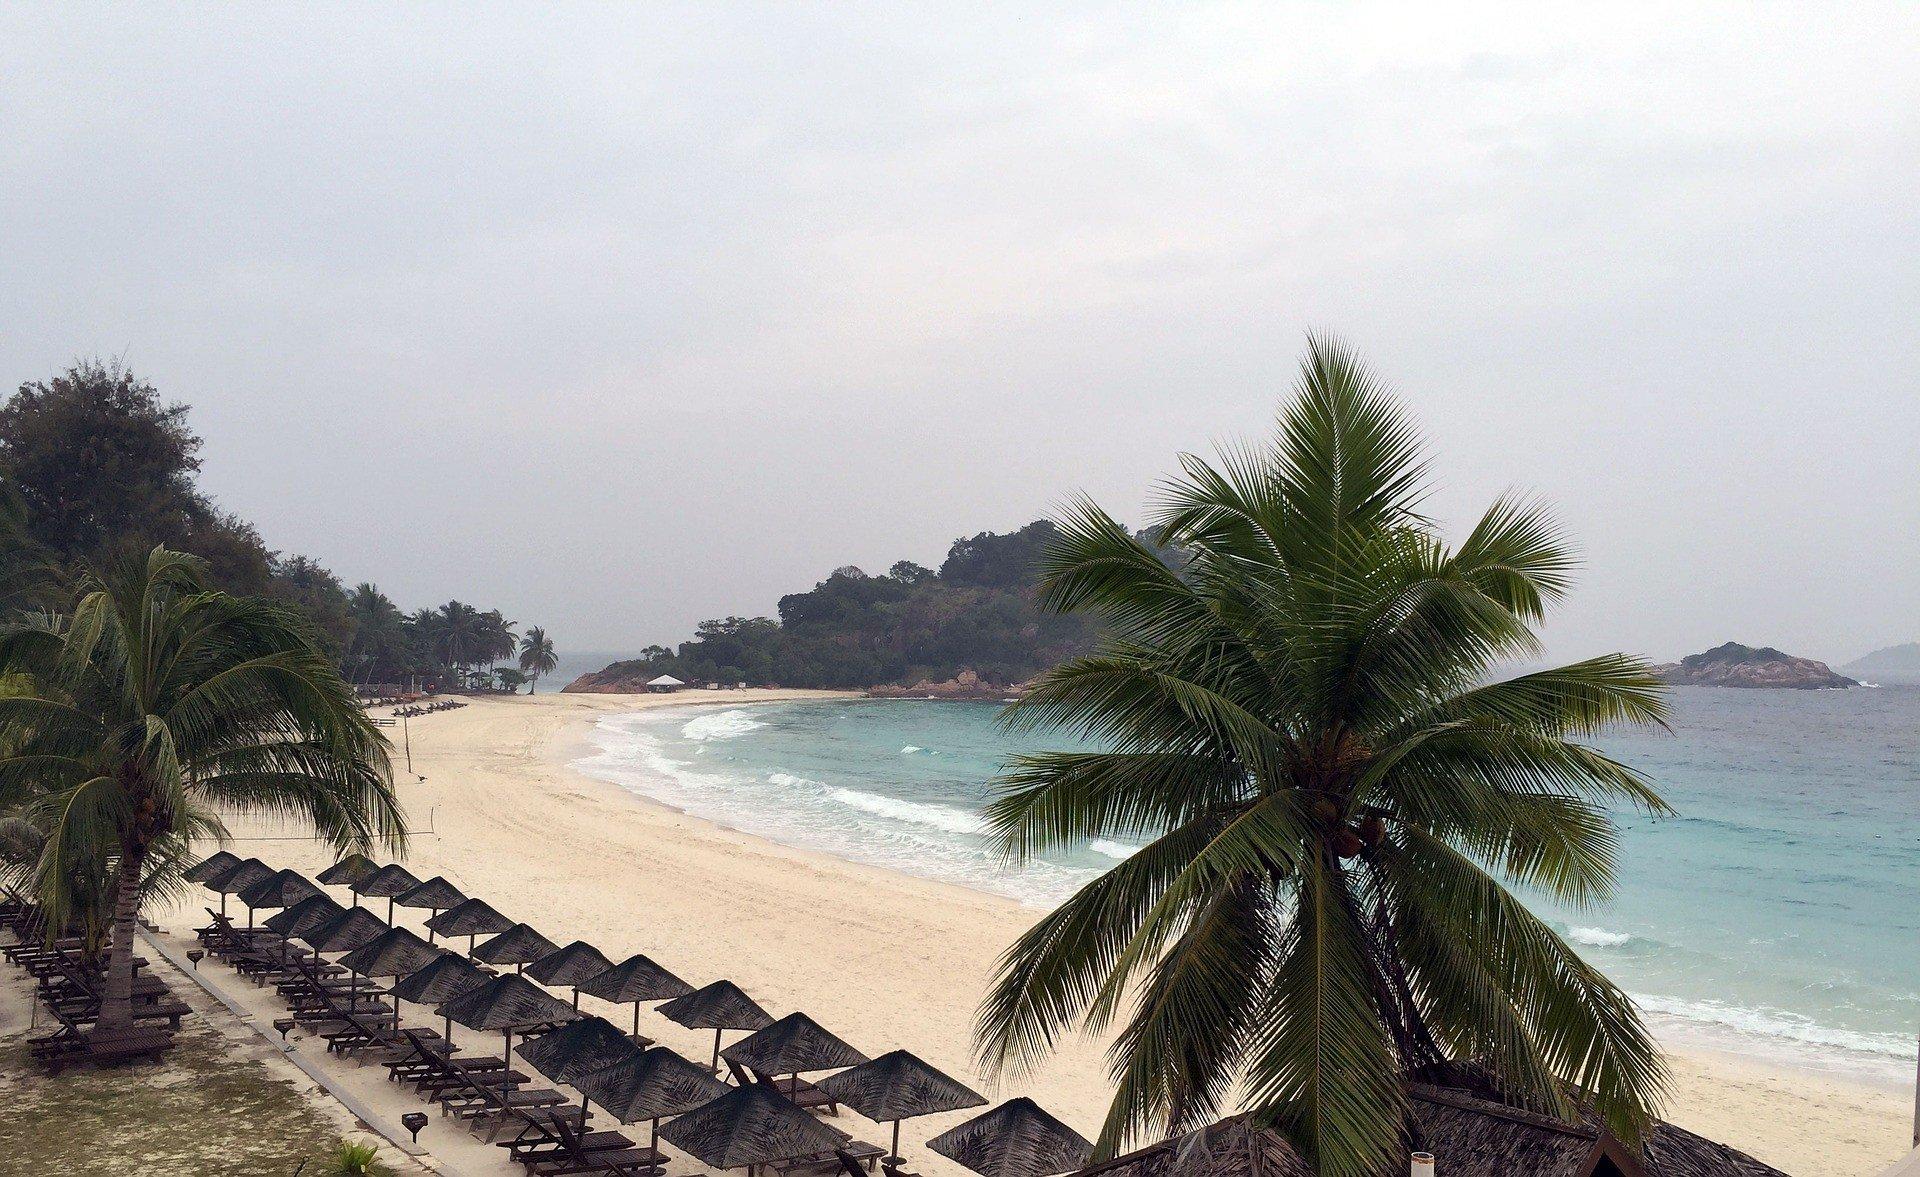 Redang Island off the coast of Terengganu State